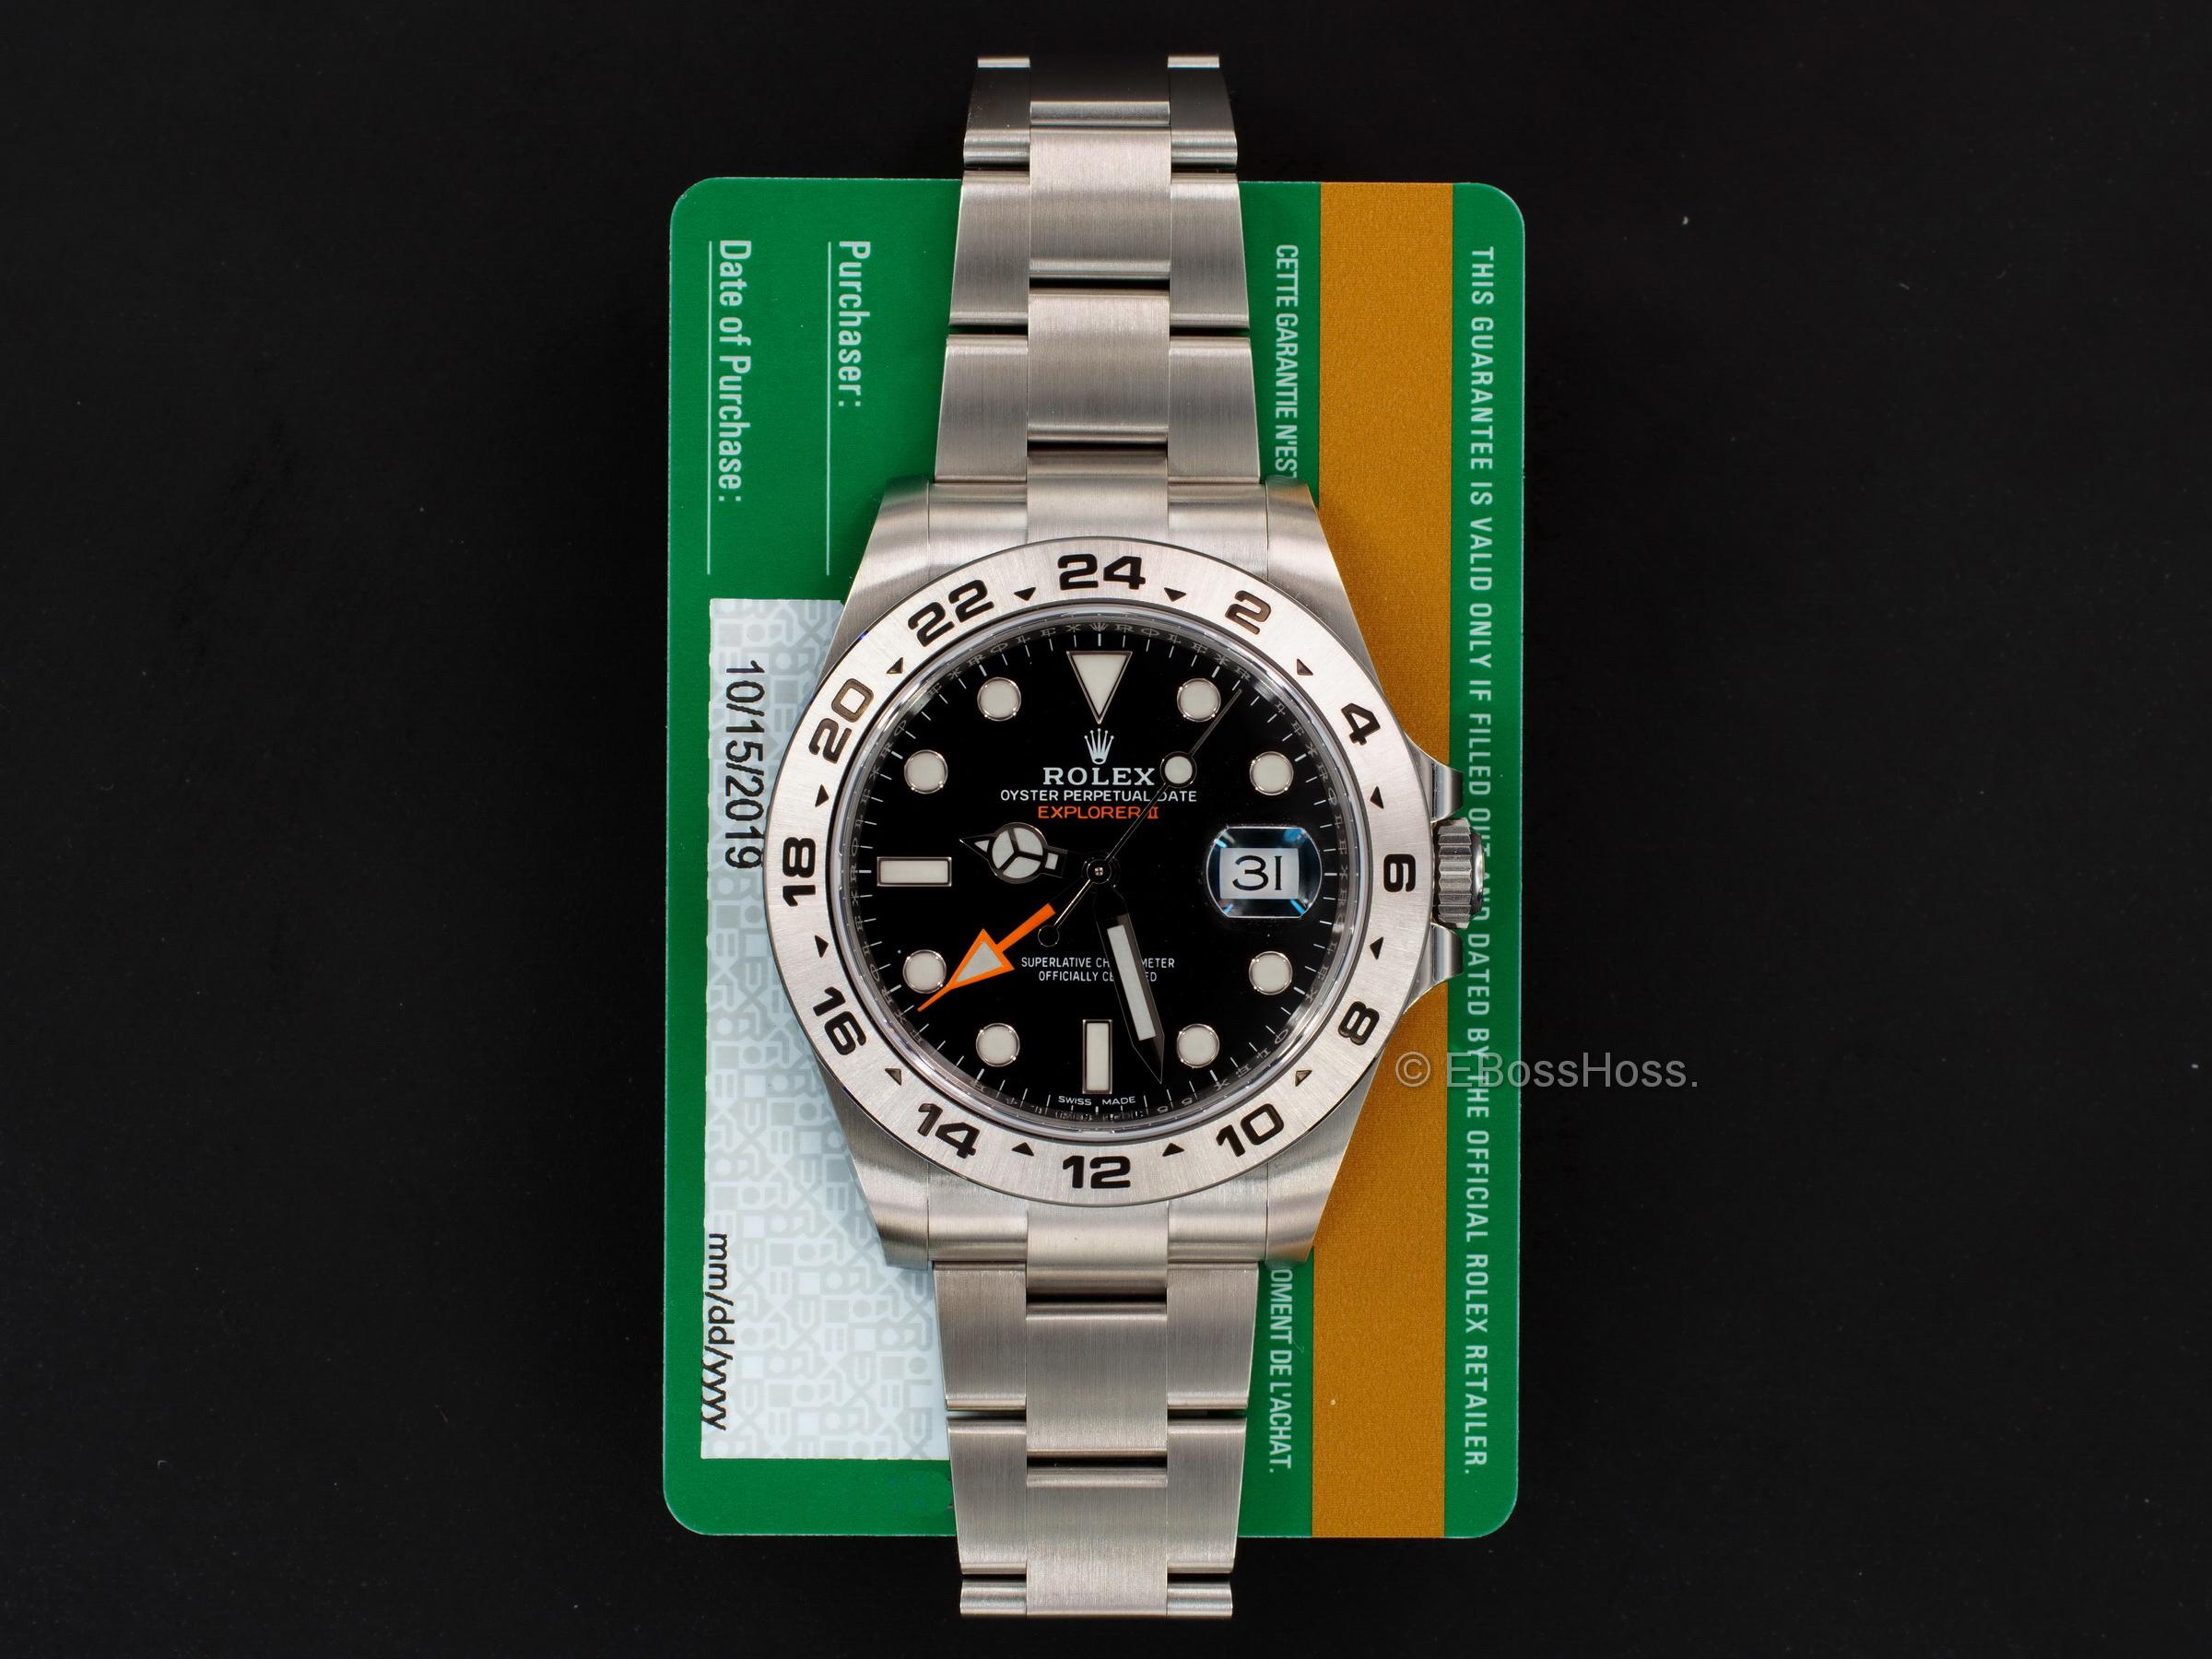 Rolex Explorer II  Black - Ref. 216570